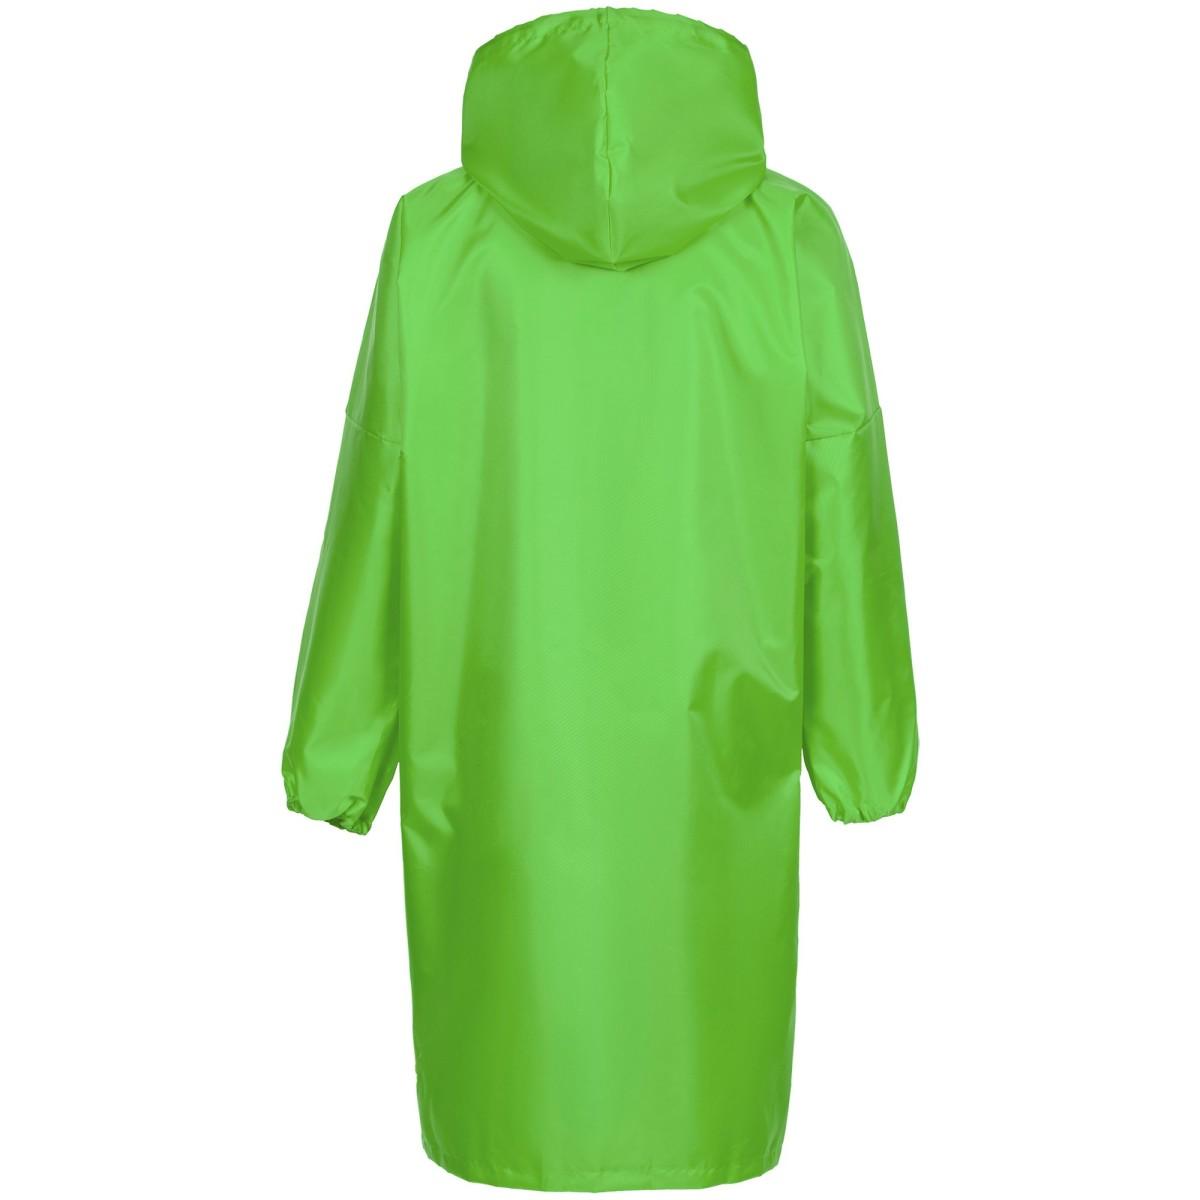 Дождевик Rainman Strong Зеленый Xxl